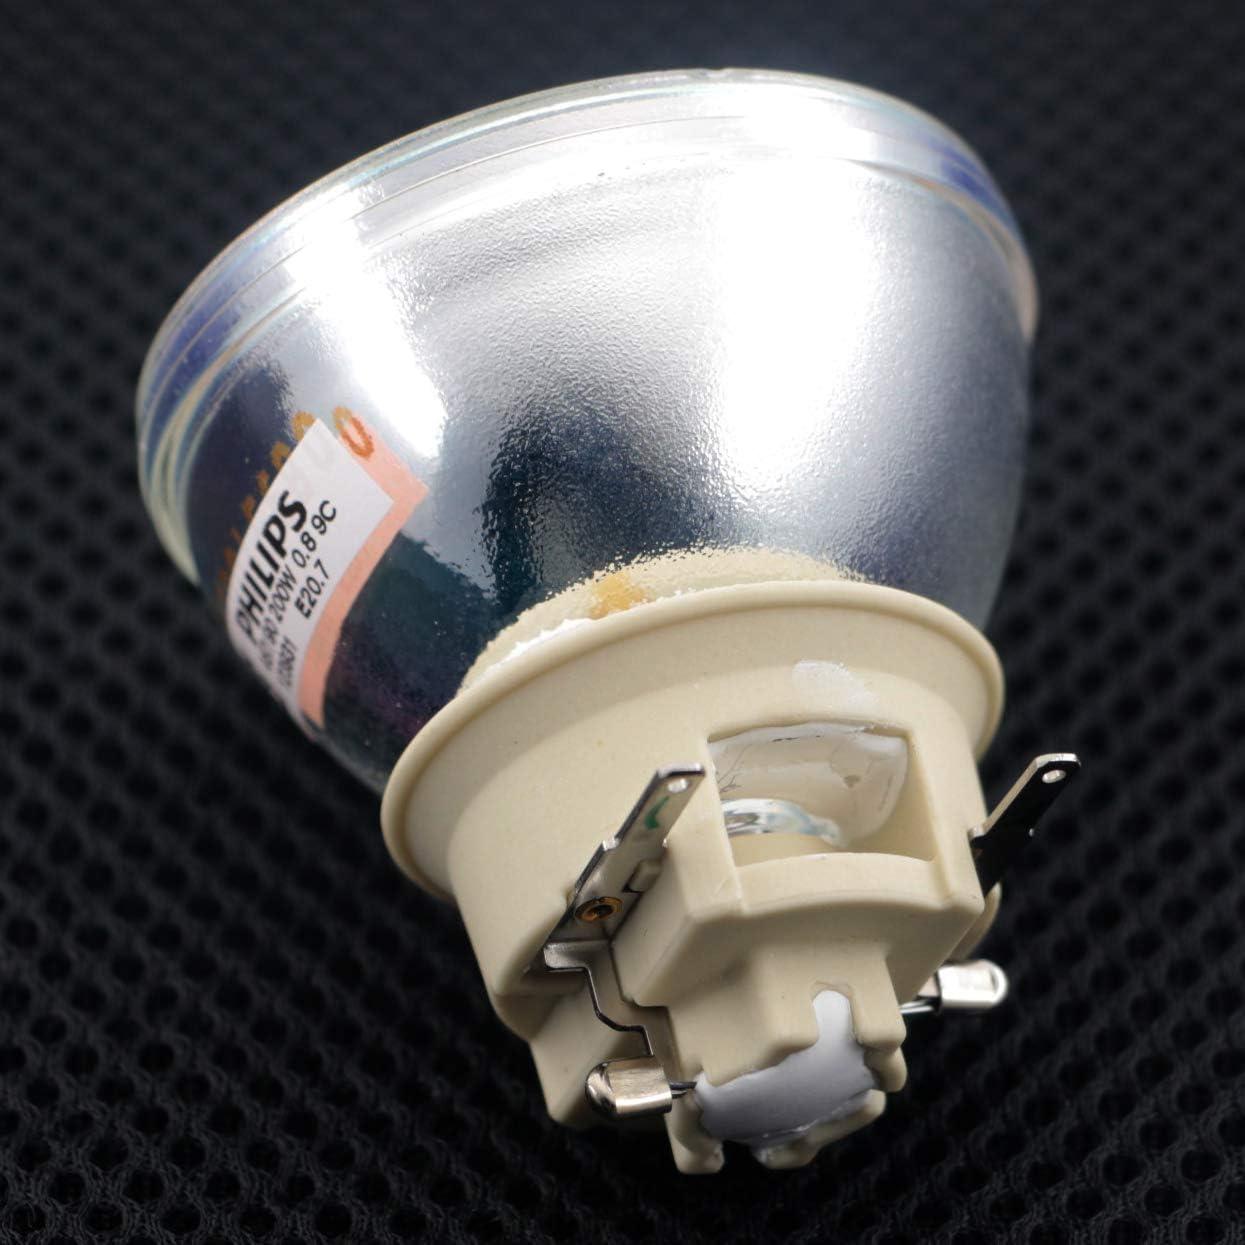 SNLAMP 5J.JGP05.001 5J.JGX05.001 L/ámpara de proyector Repuesto 200W Bombilla para BENQ DX808ST DX825ST MX808PST MX808ST MX825ST MX604 MX604W MS550 MX550 MH606 MH606w proyectores